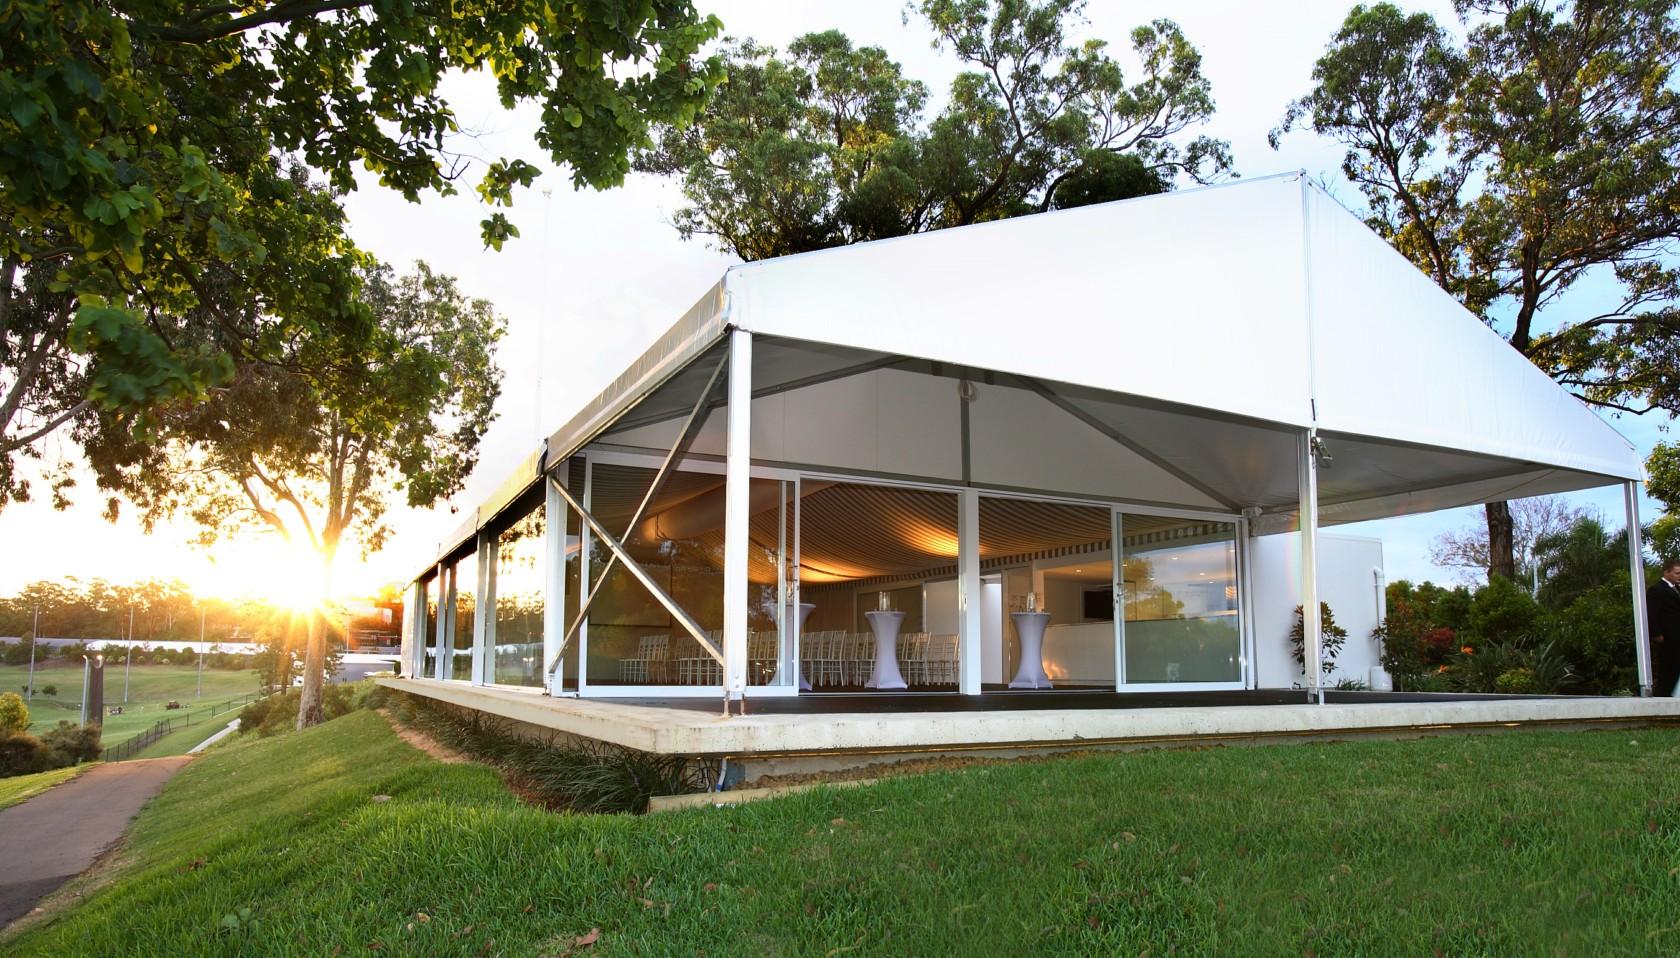 Садовый шатер на фундаменте